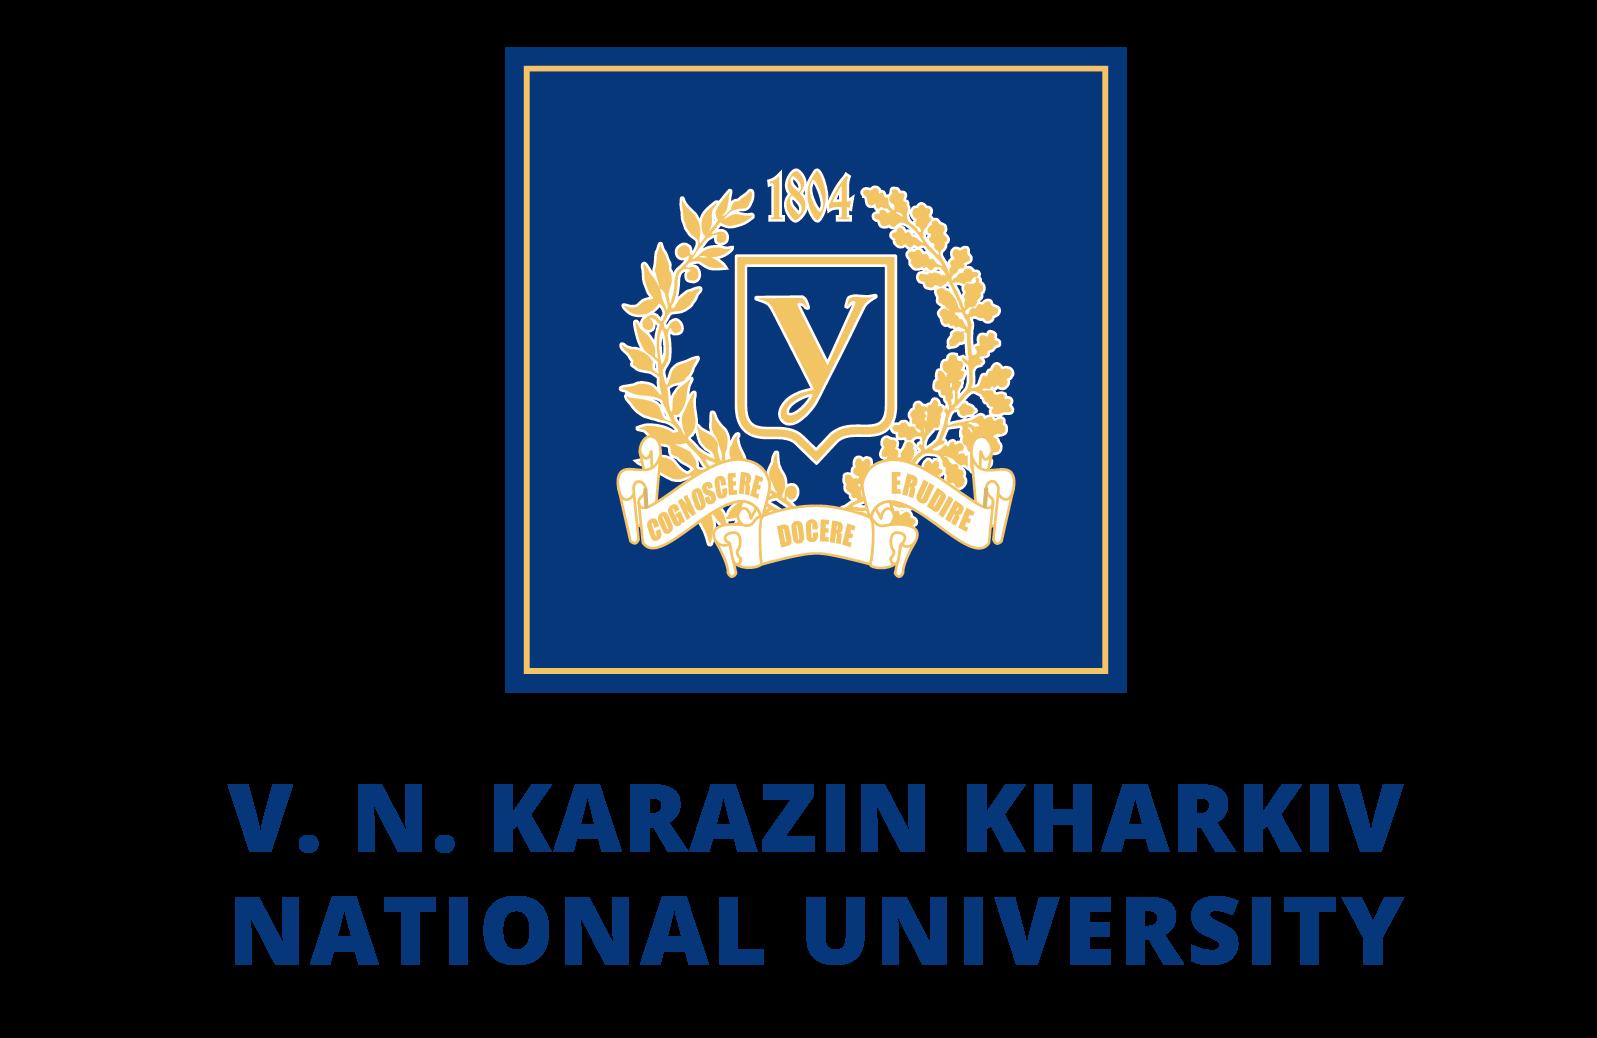 Logo of V.N. Karazin Kharkiv National University